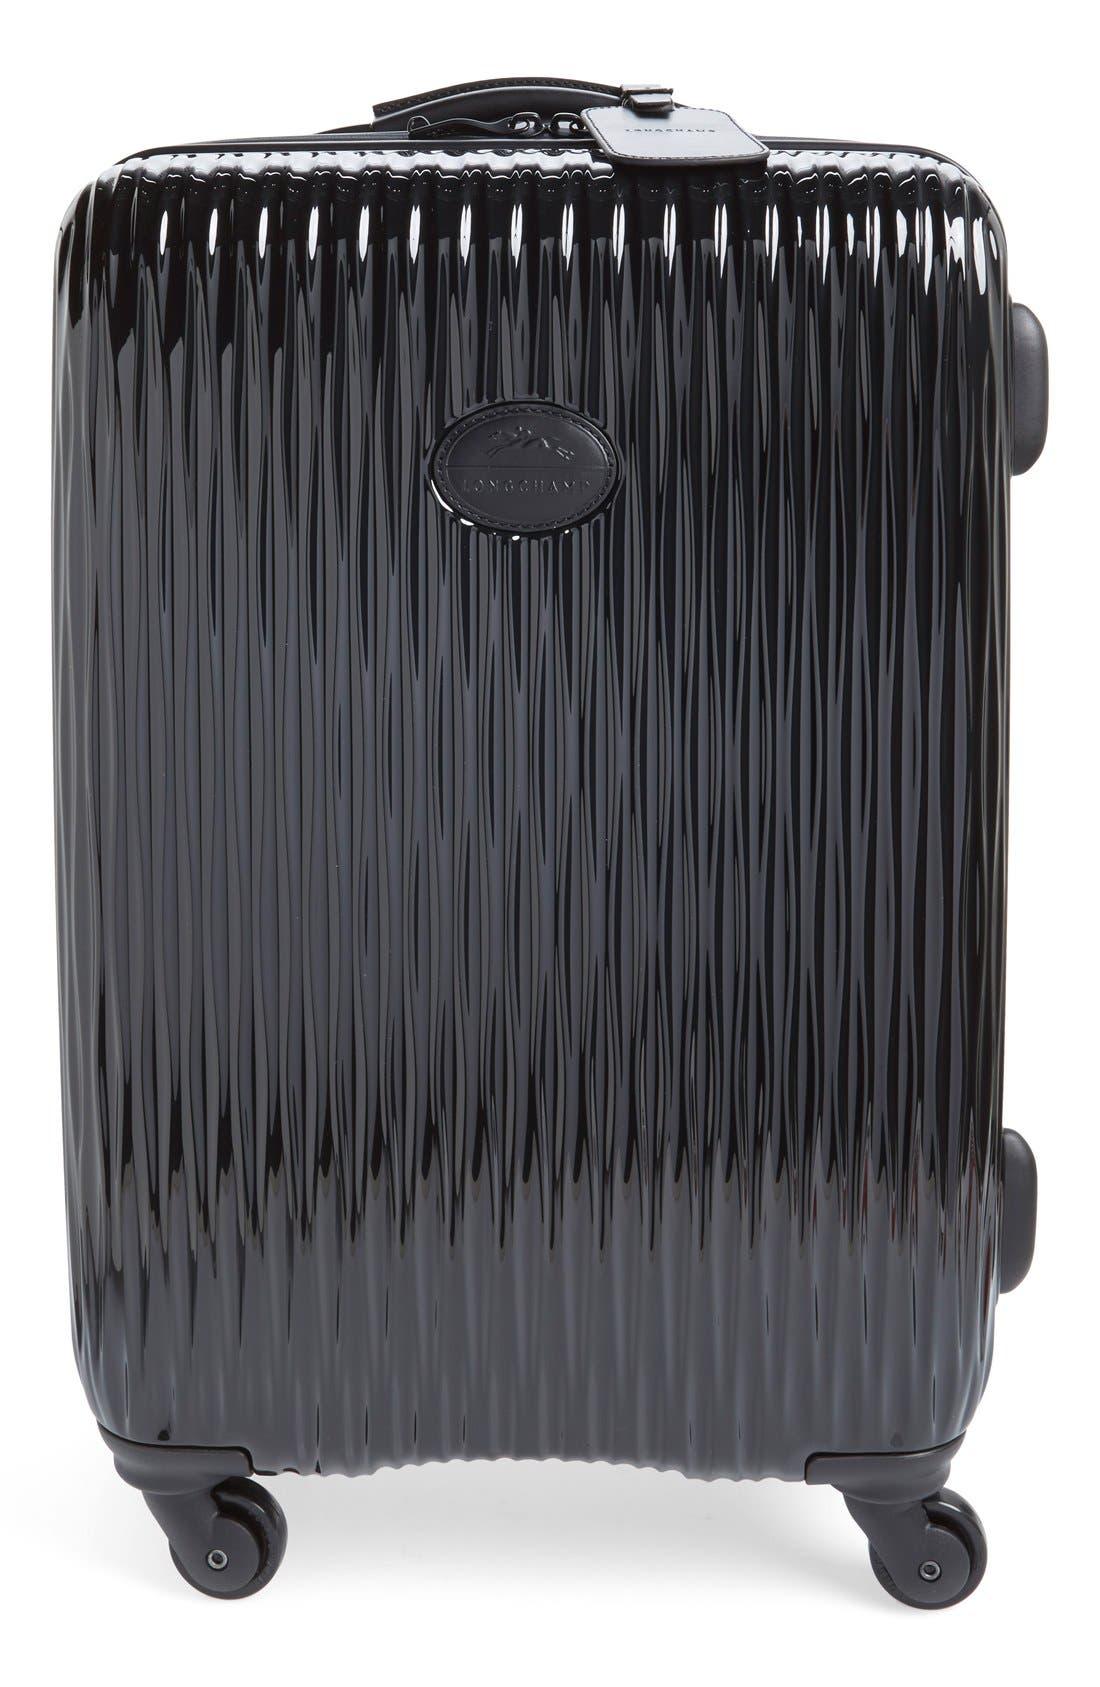 Longchamp 'Medium Fairval' Four-Wheel Hard Shell Suitcase (25 Inch)